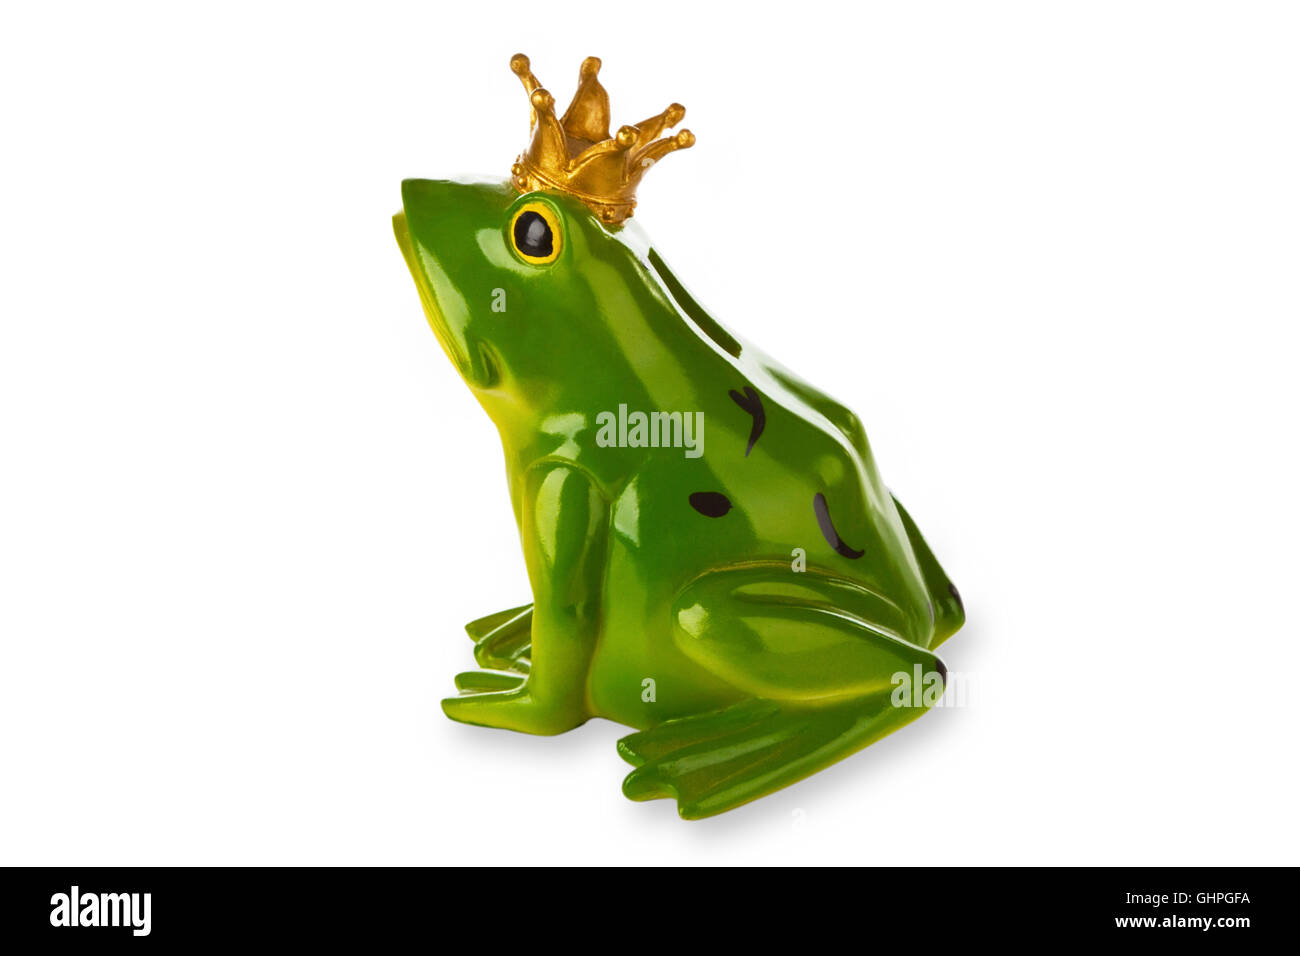 Ceramic Frog Stock Photos Amp Ceramic Frog Stock Images Alamy